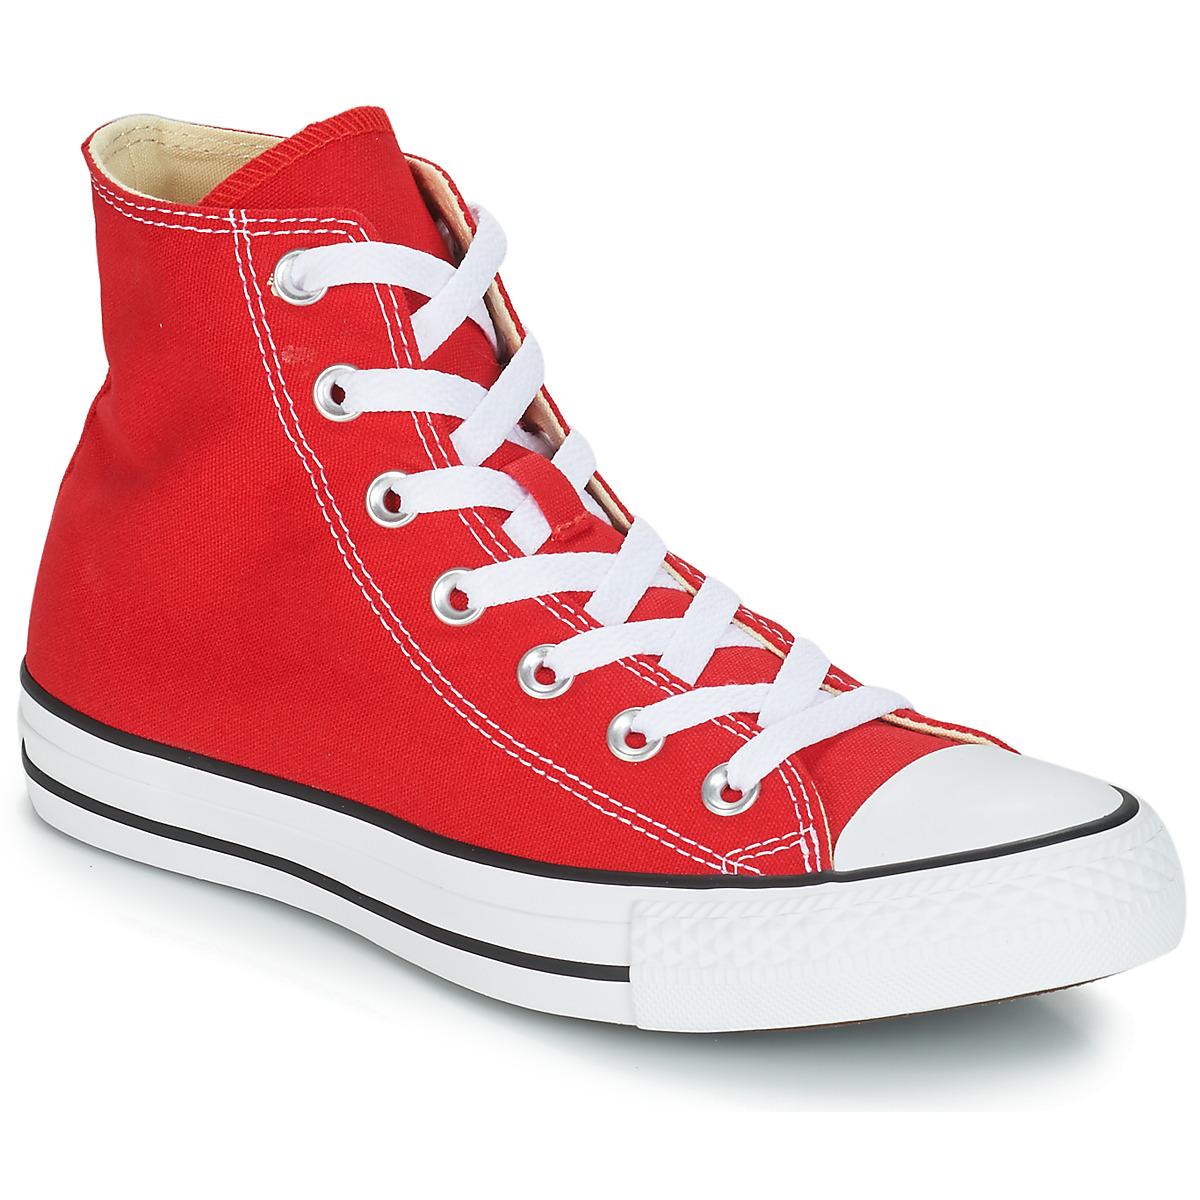 Converse ALL STAR CORE HI Red